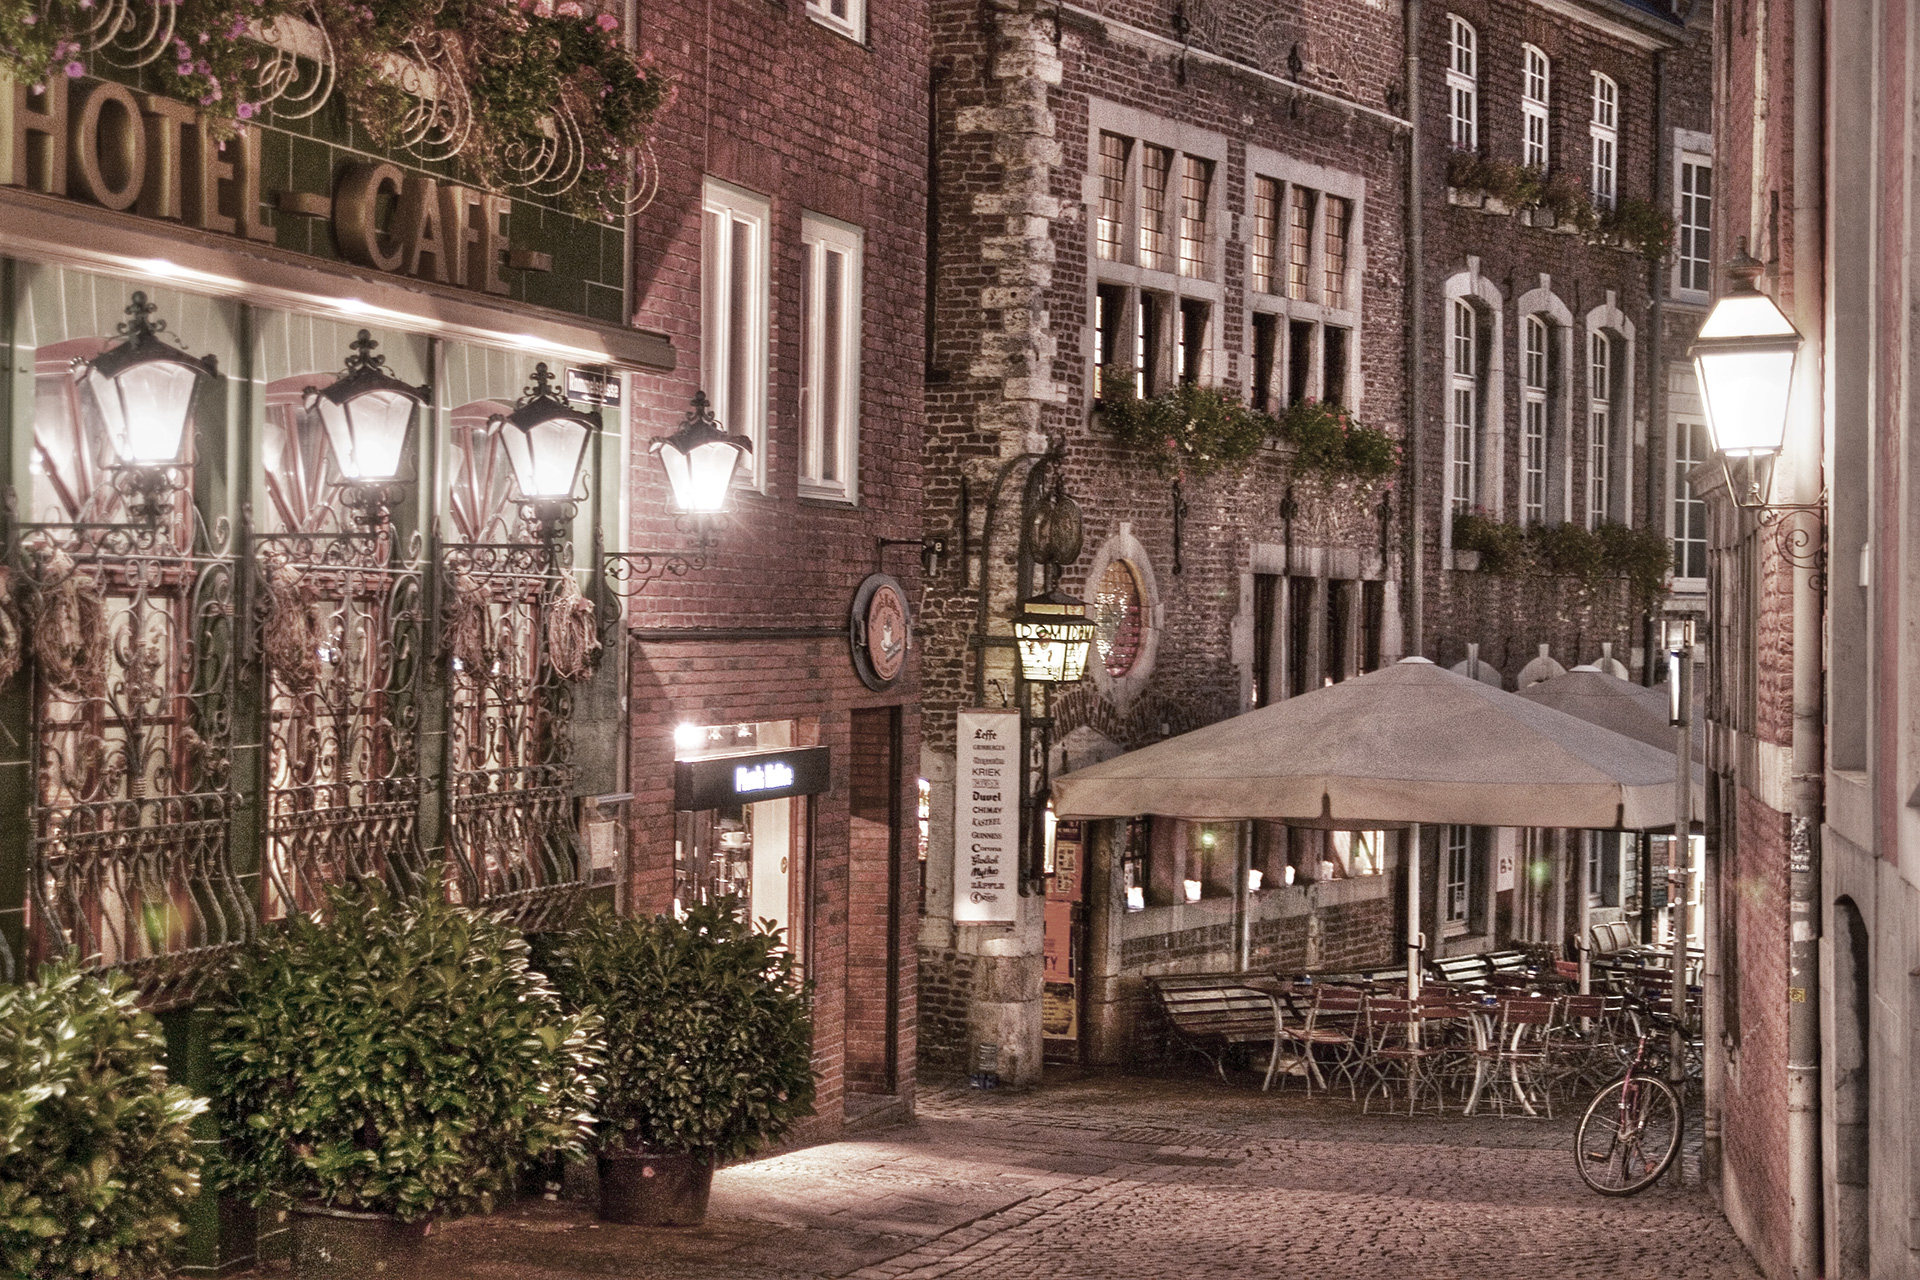 hotel_cafe